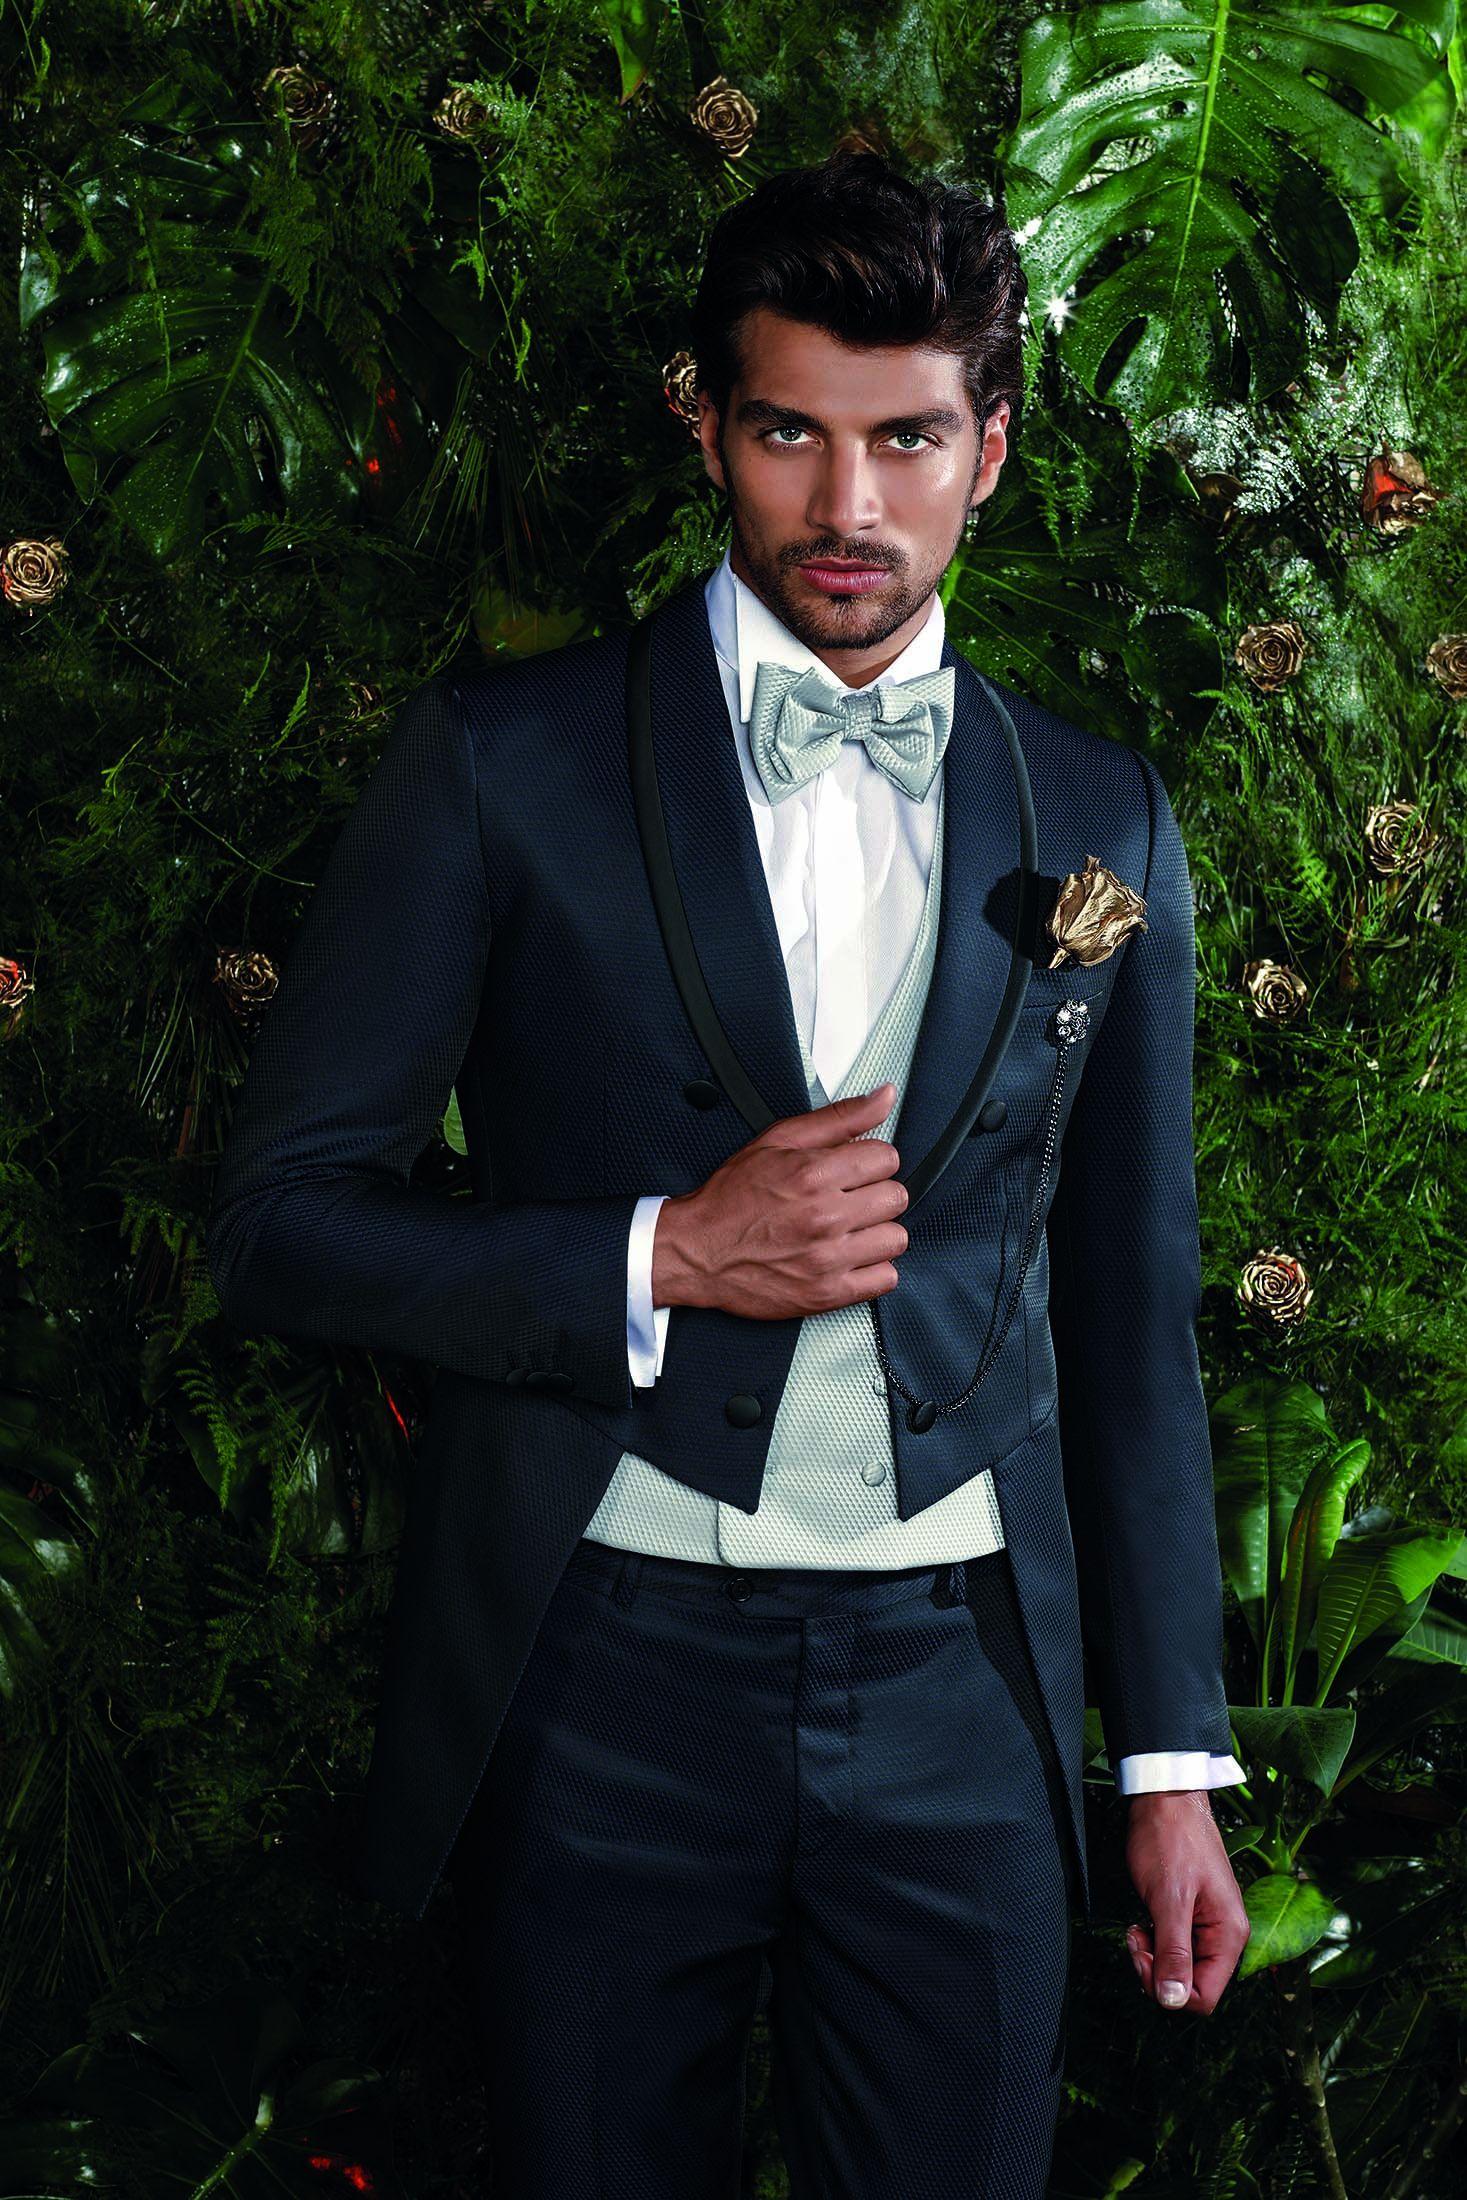 ed06538e3 Traje de Novio de Petrelli Uomo (MOD 869)  bodas  weddings  bodasnet   weddingshoes  groom  suit  groomsoutfit  lookdenovio  trajedenovio   lookoftheday ...